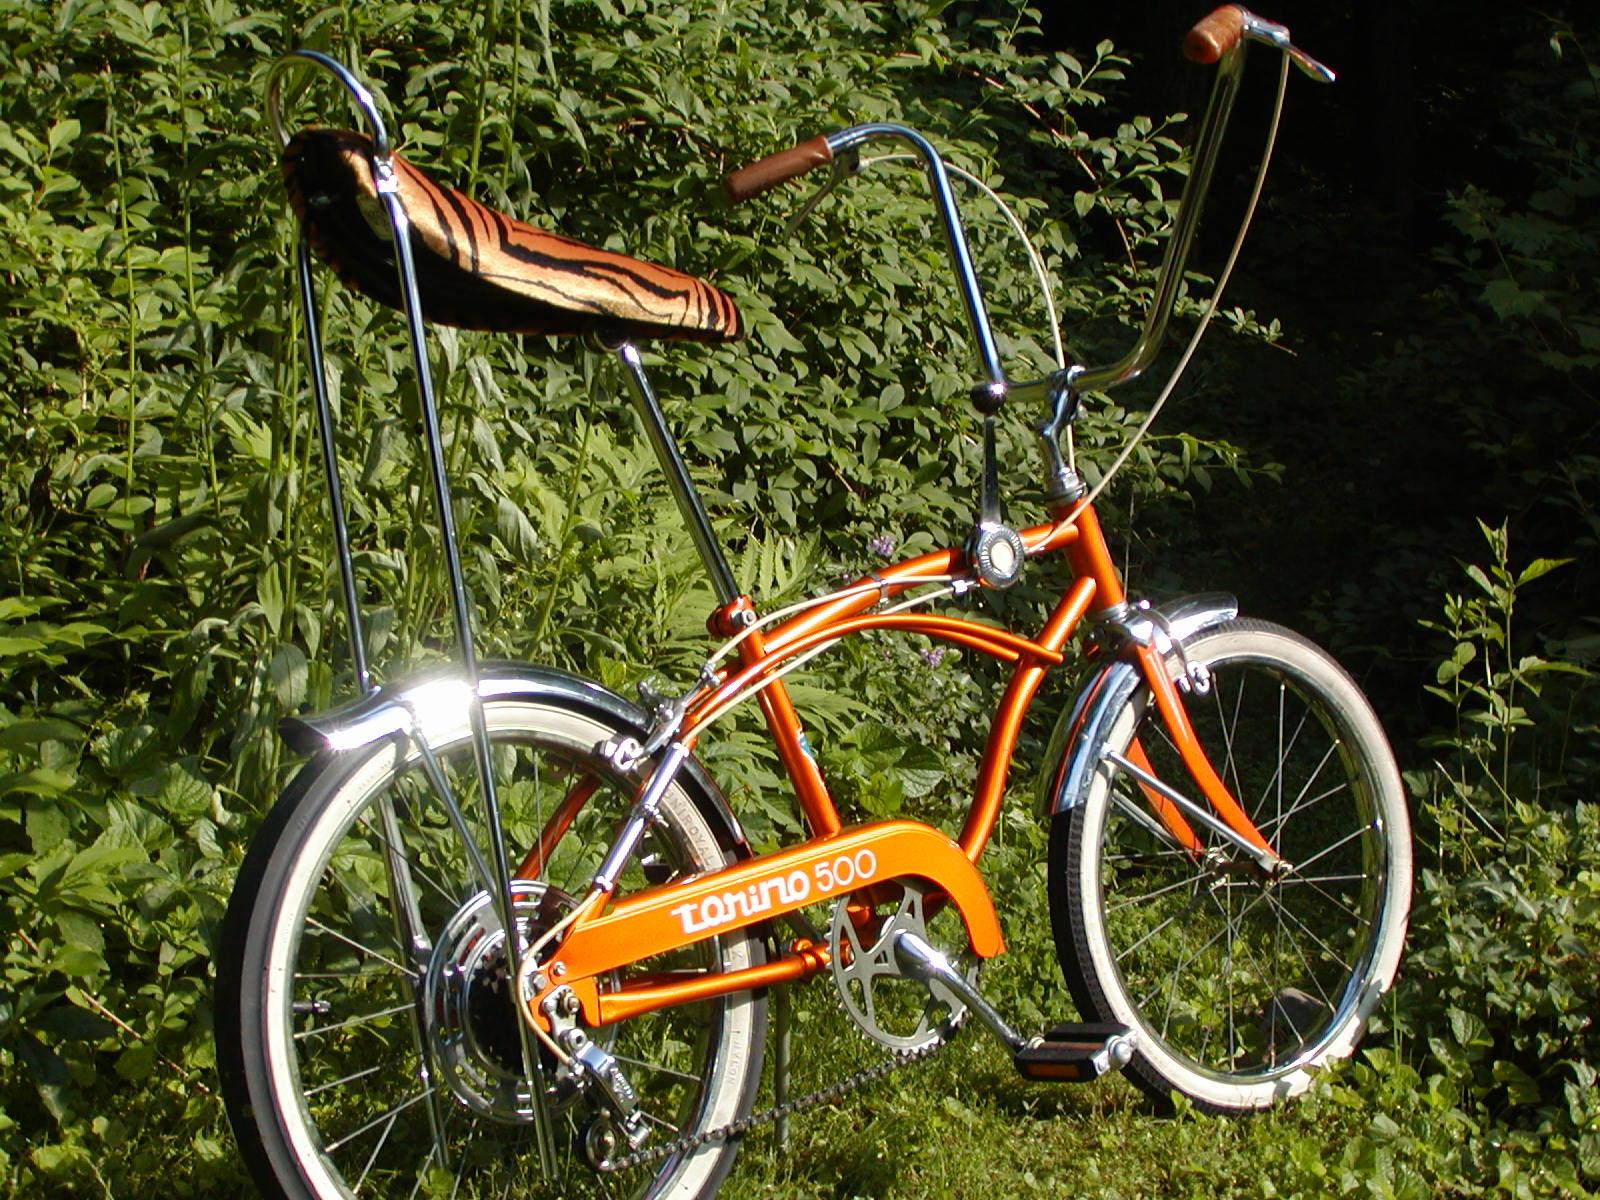 Craigslist Cookeville Tn >> Nashville Bicycles Craigslist | 2017, 2018, 2019 Ford Price, Release Date, Reviews